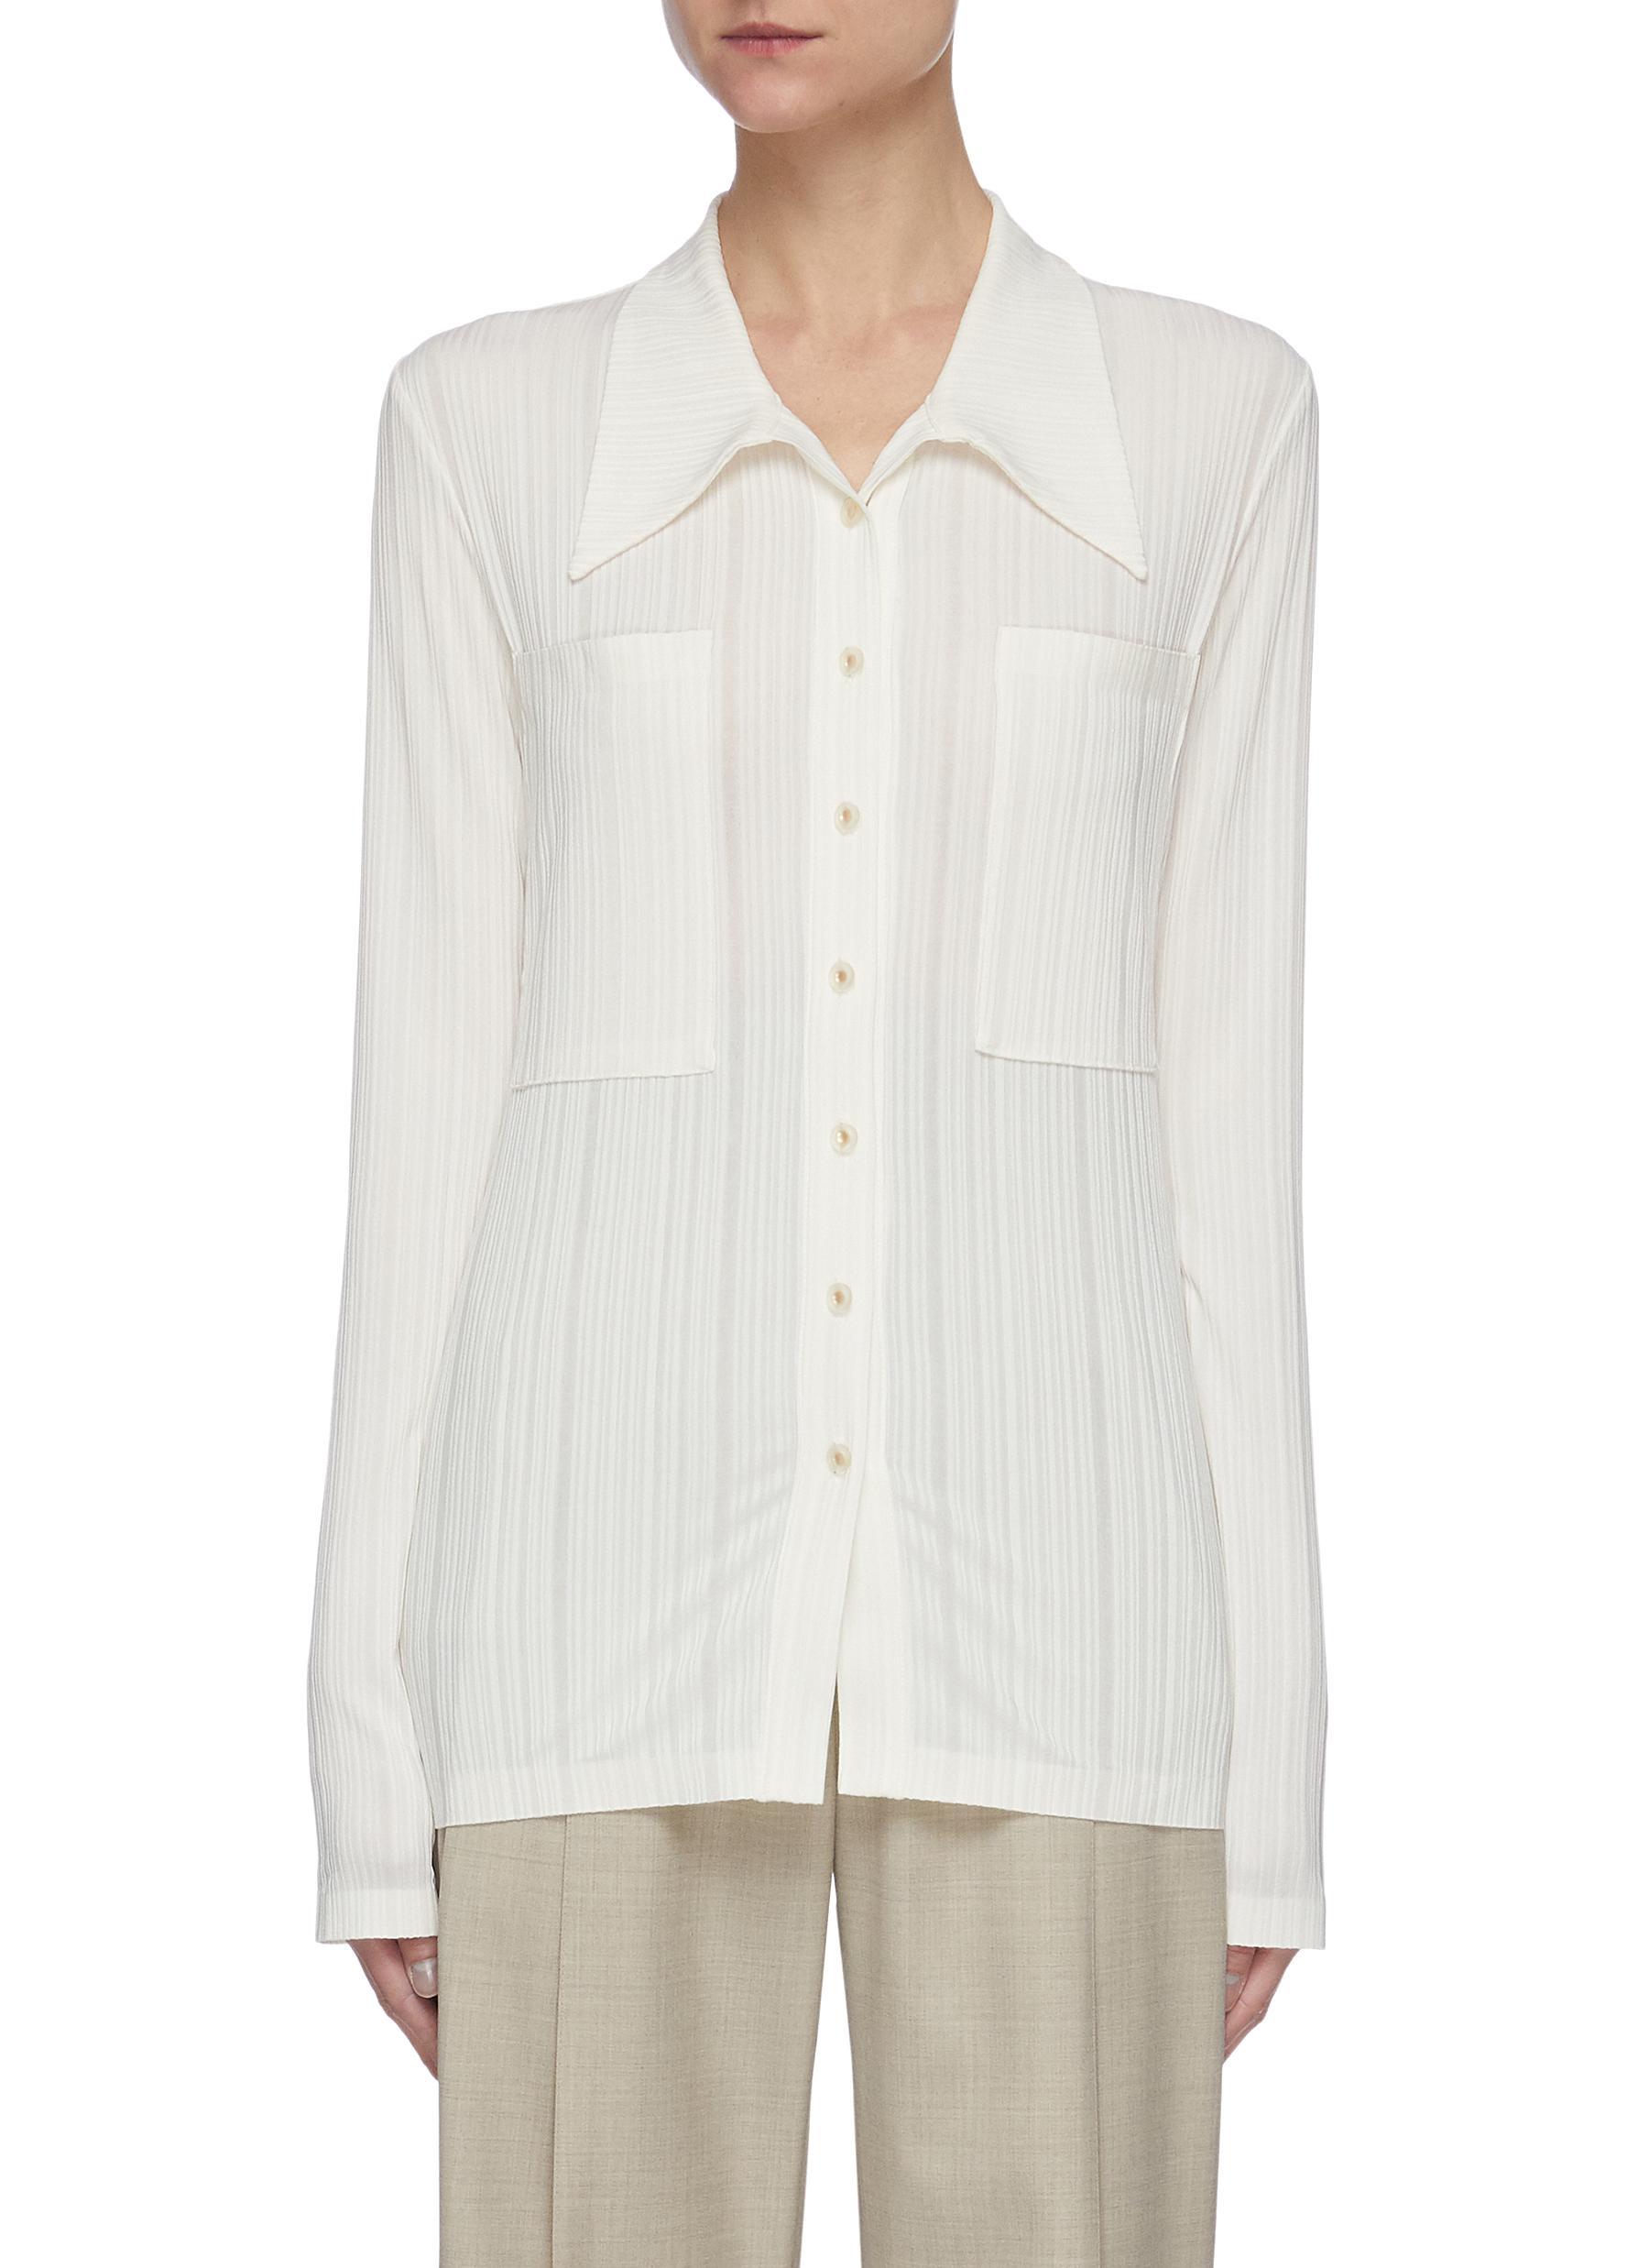 Low Classic Shirts OVERSIZE COLLAR PATCH POCKET STRIPE SHIRT